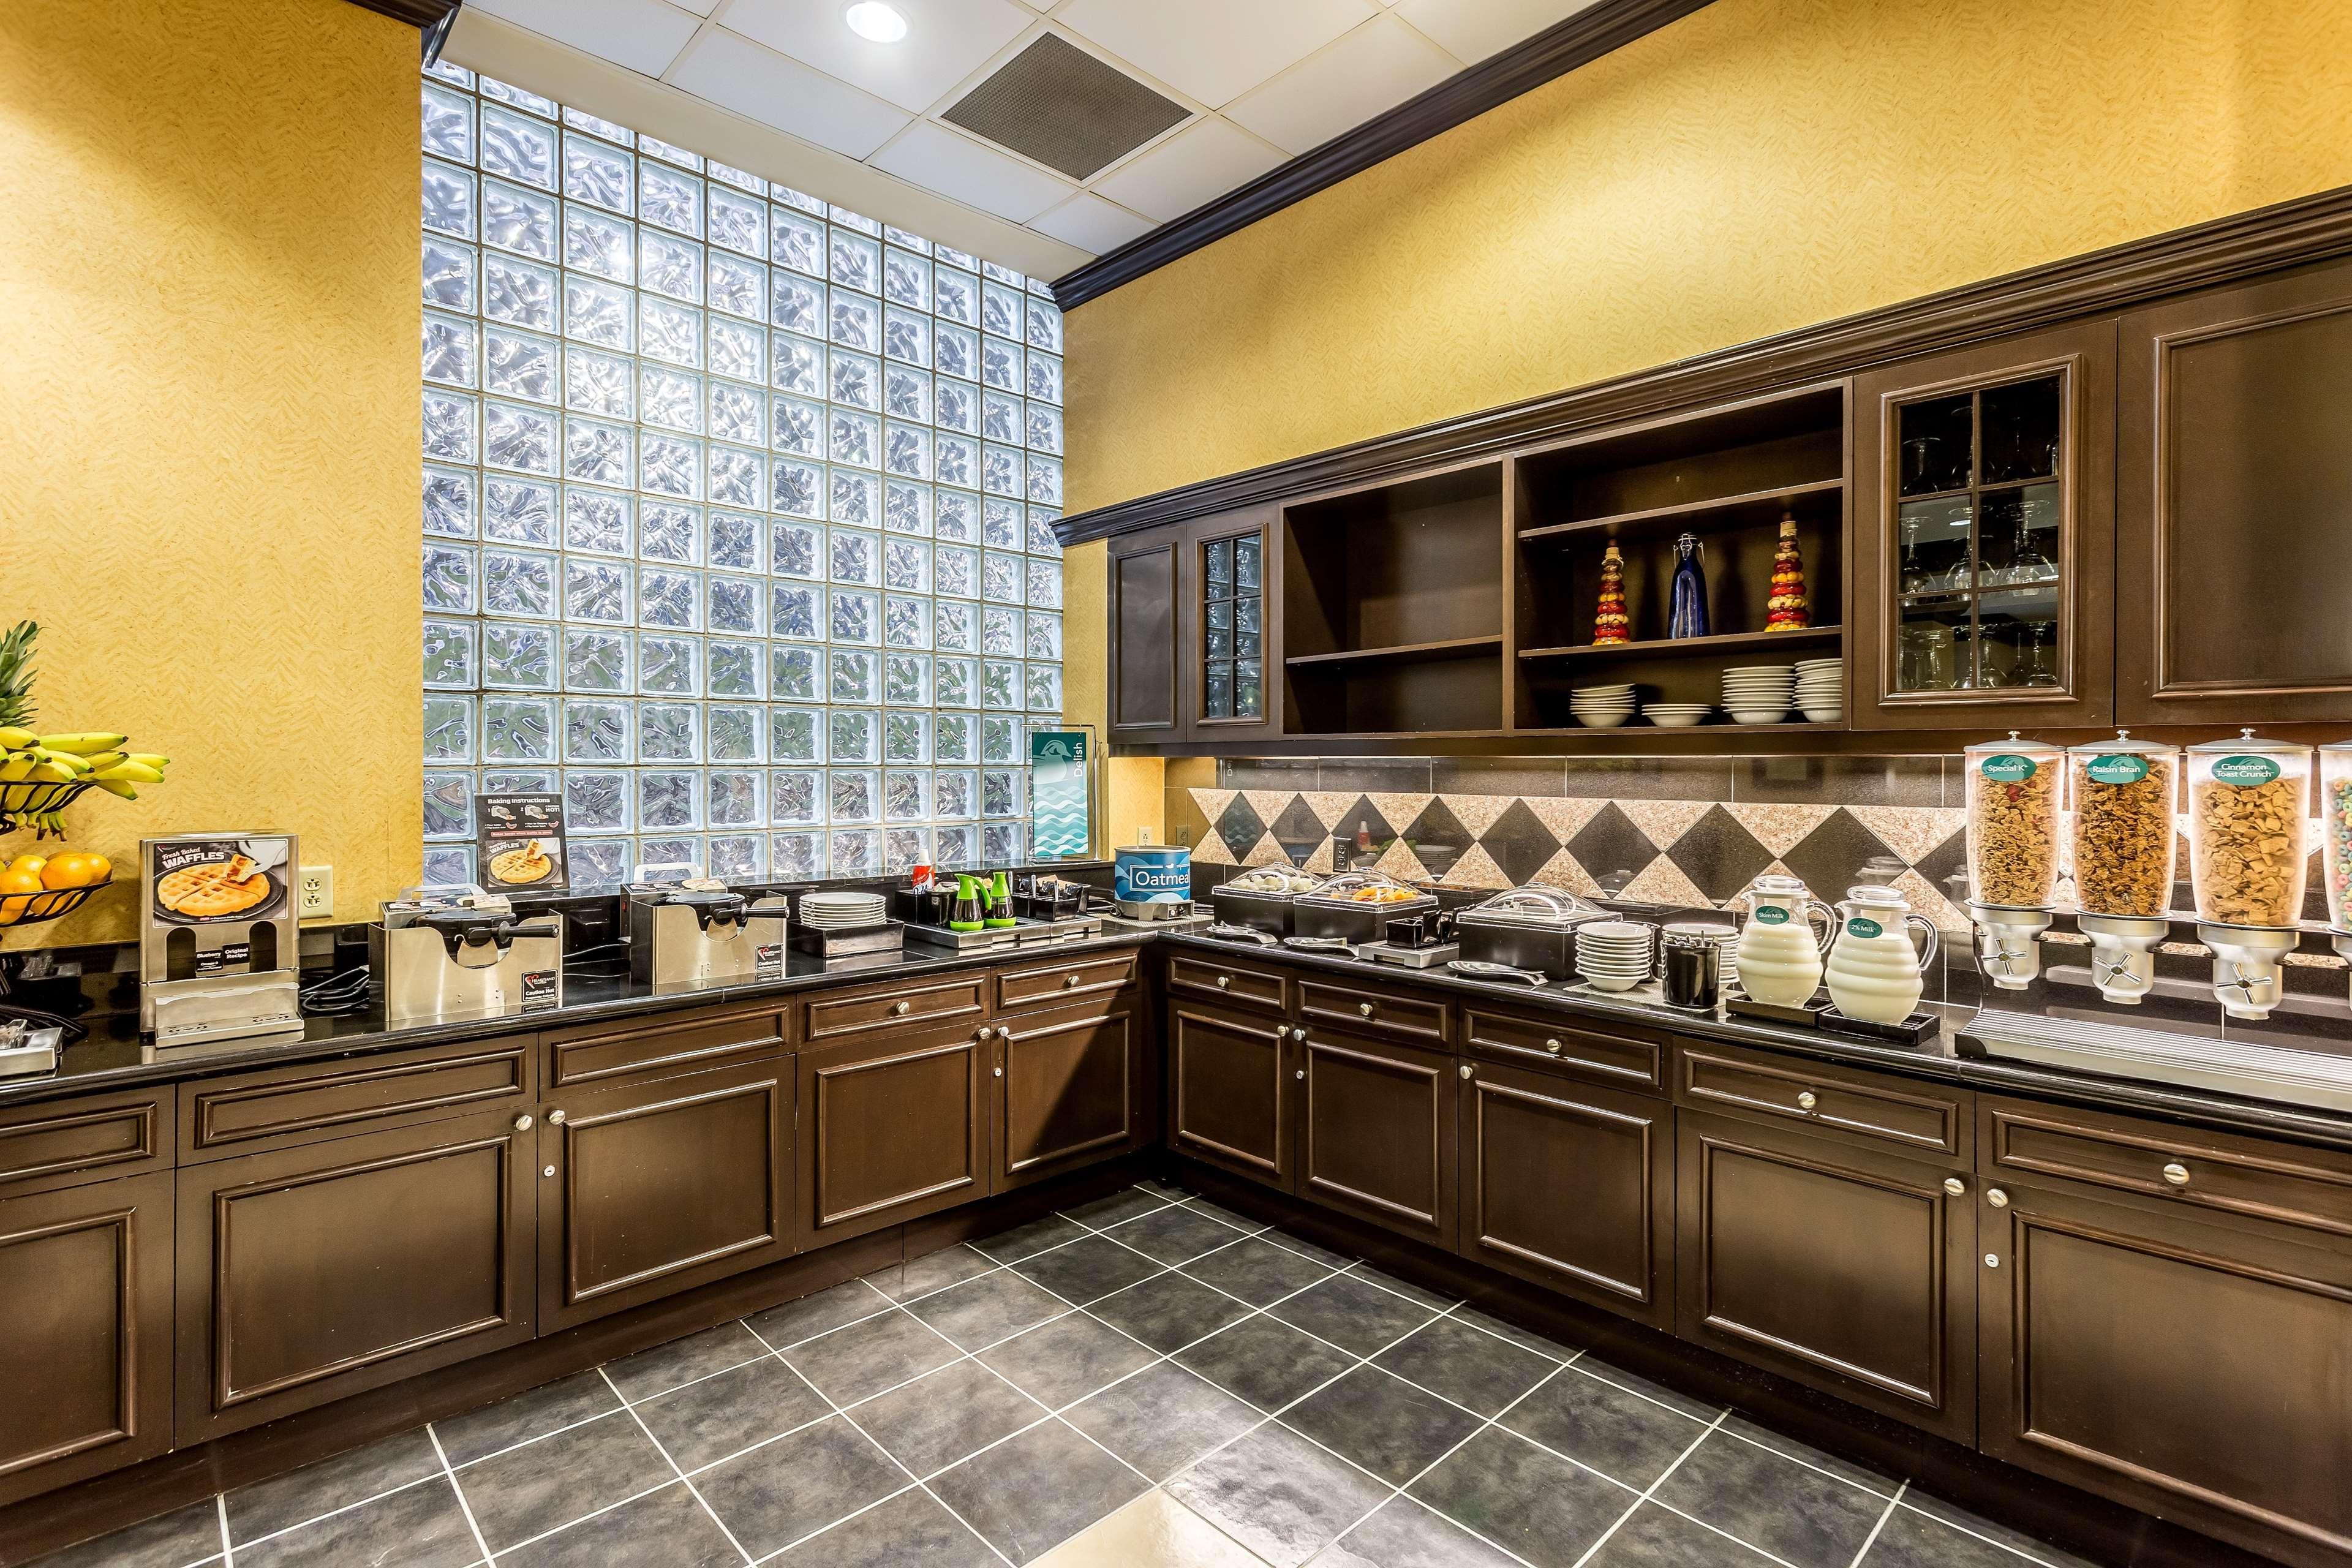 Homewood Suites by Hilton Nashville-Downtown image 6